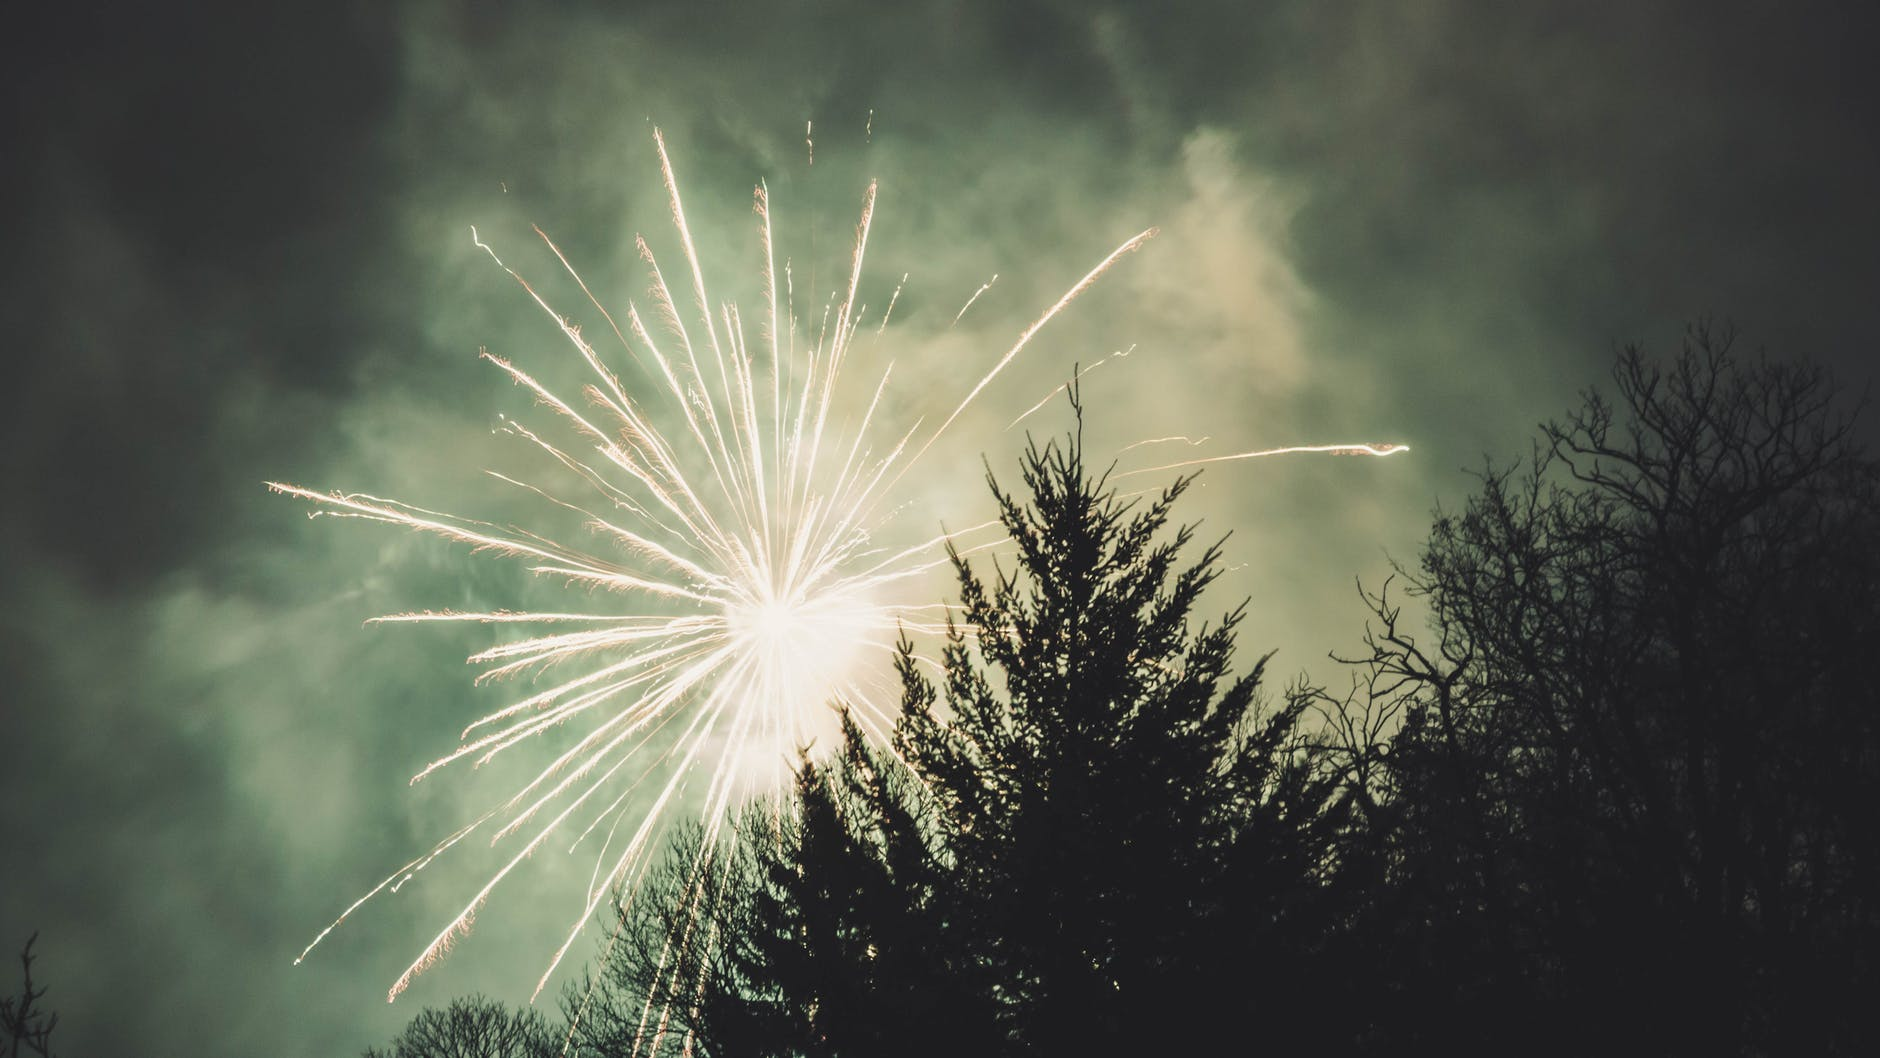 fireworks display above trees